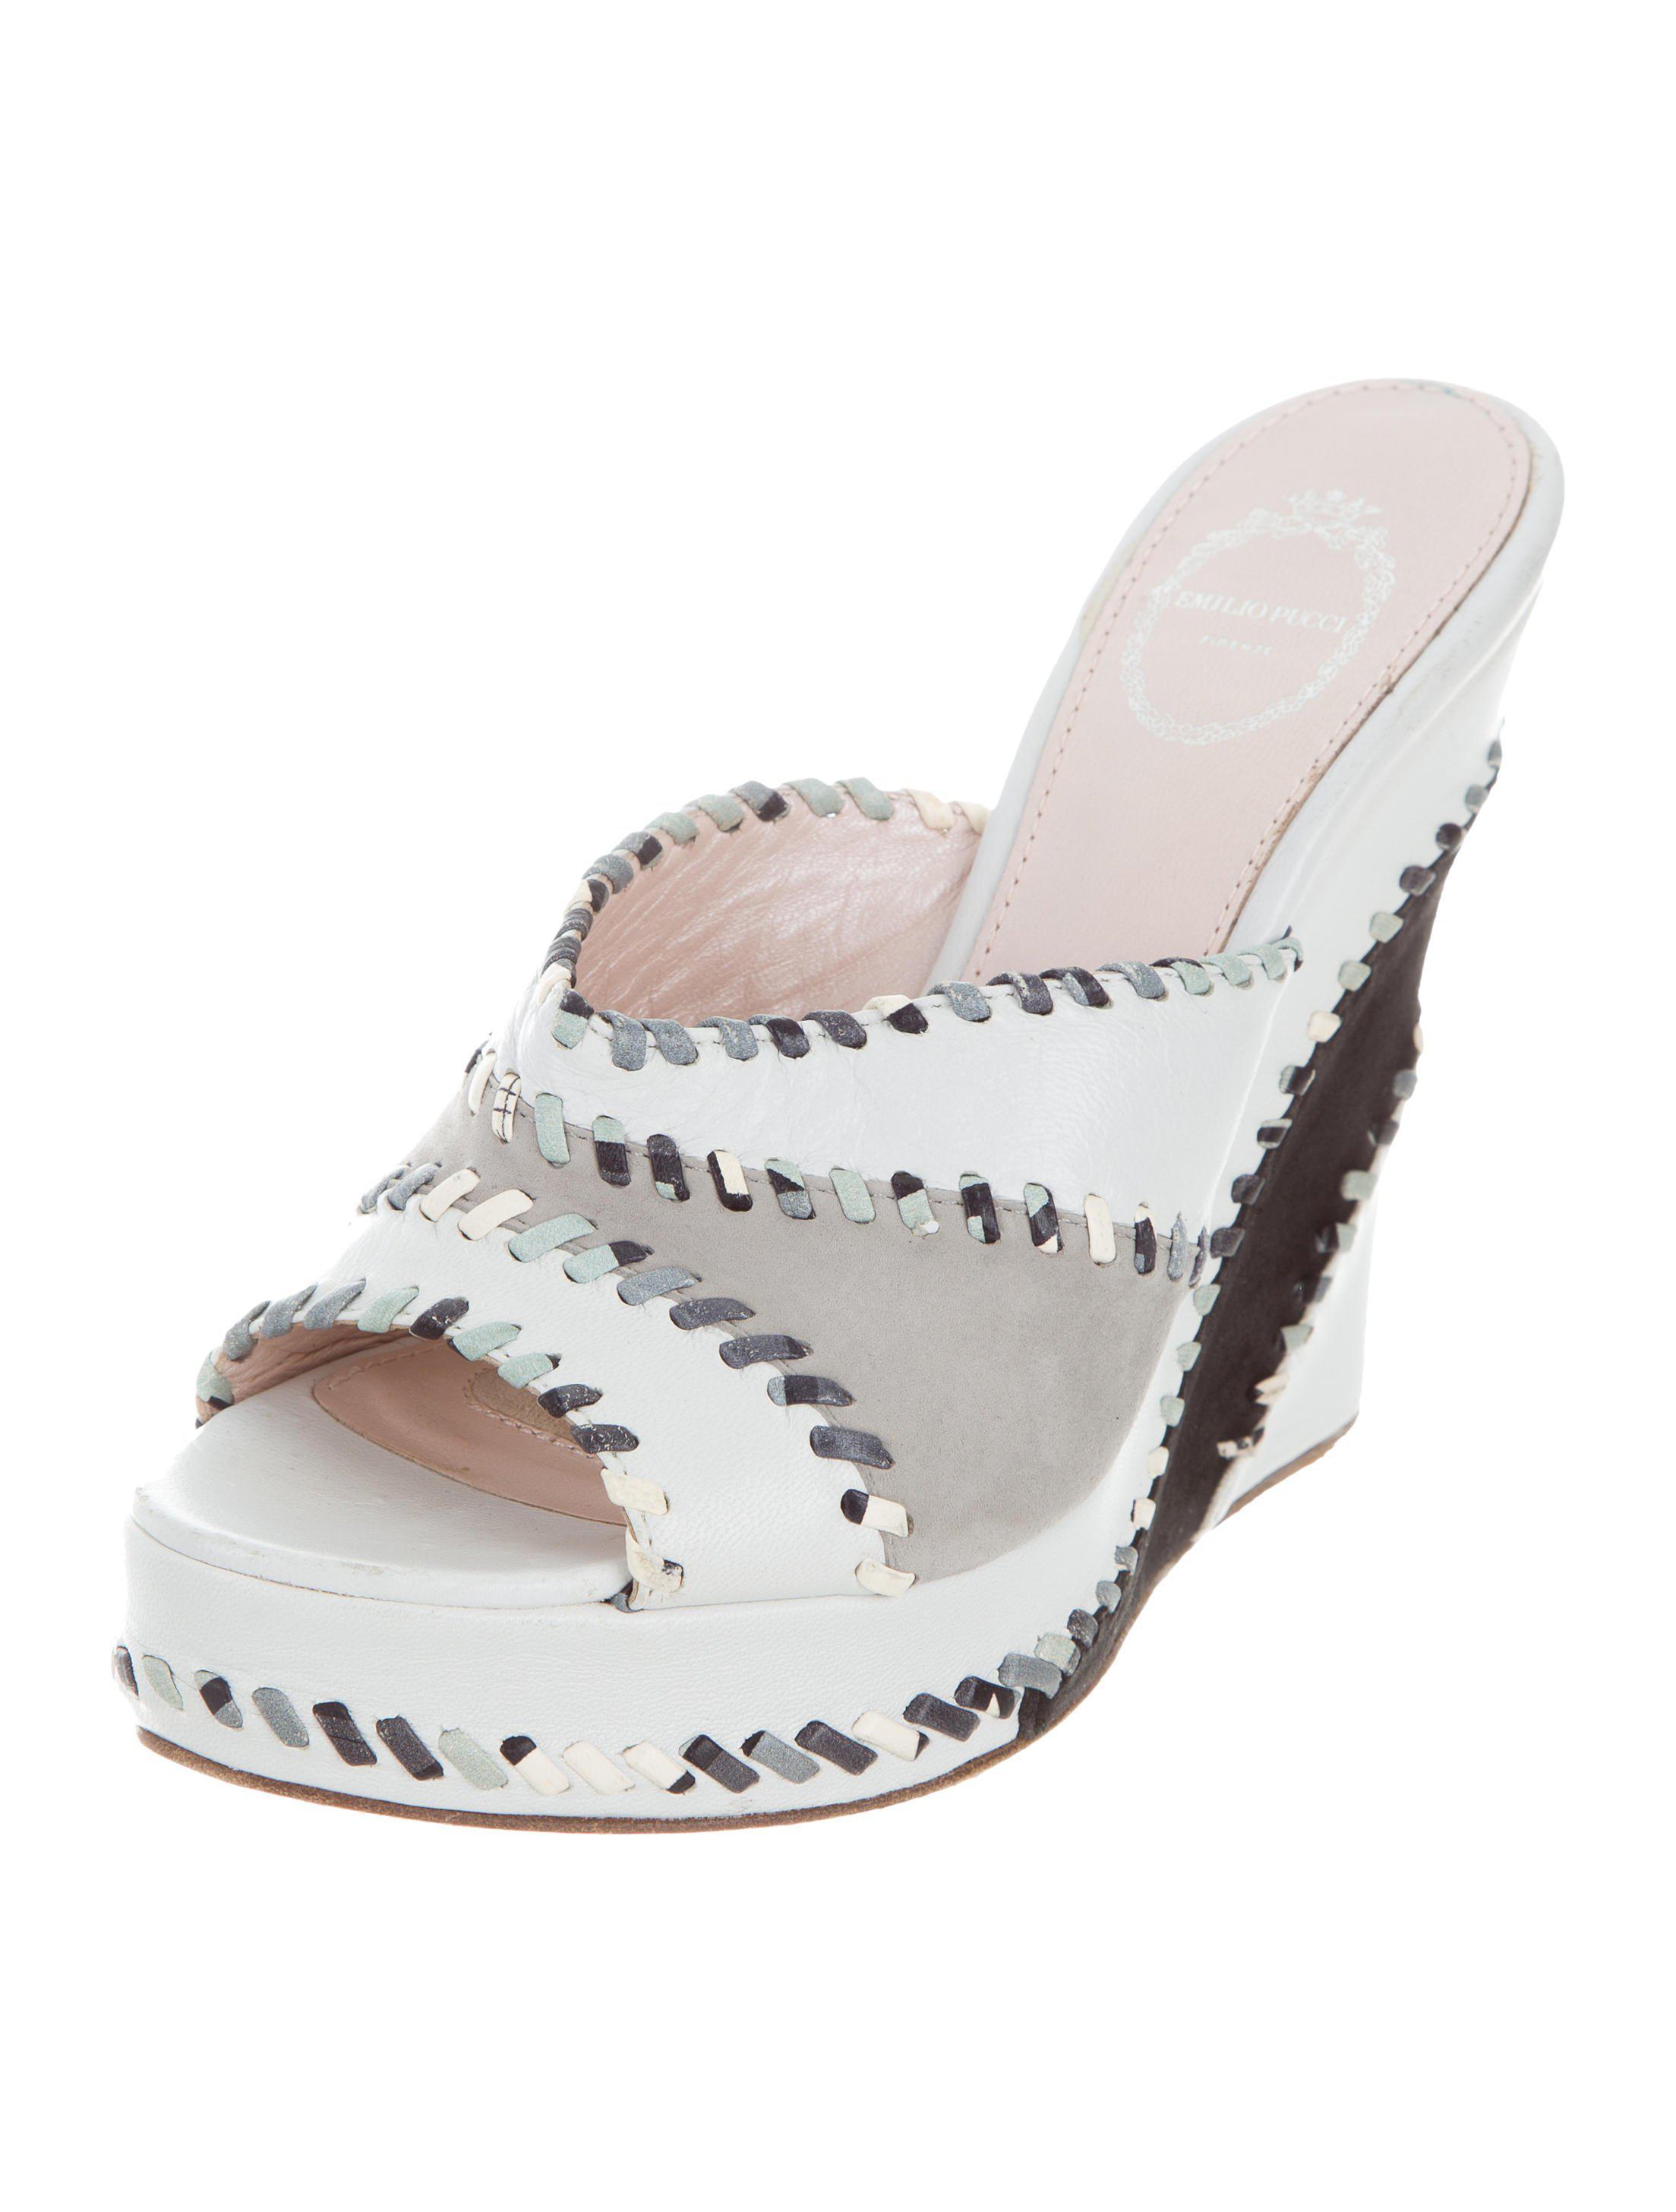 Emilio Pucci Platform Slide Sandals choice for sale shop offer cheap price free shipping best sale cheap online largest supplier for sale VIpiIQfa9N